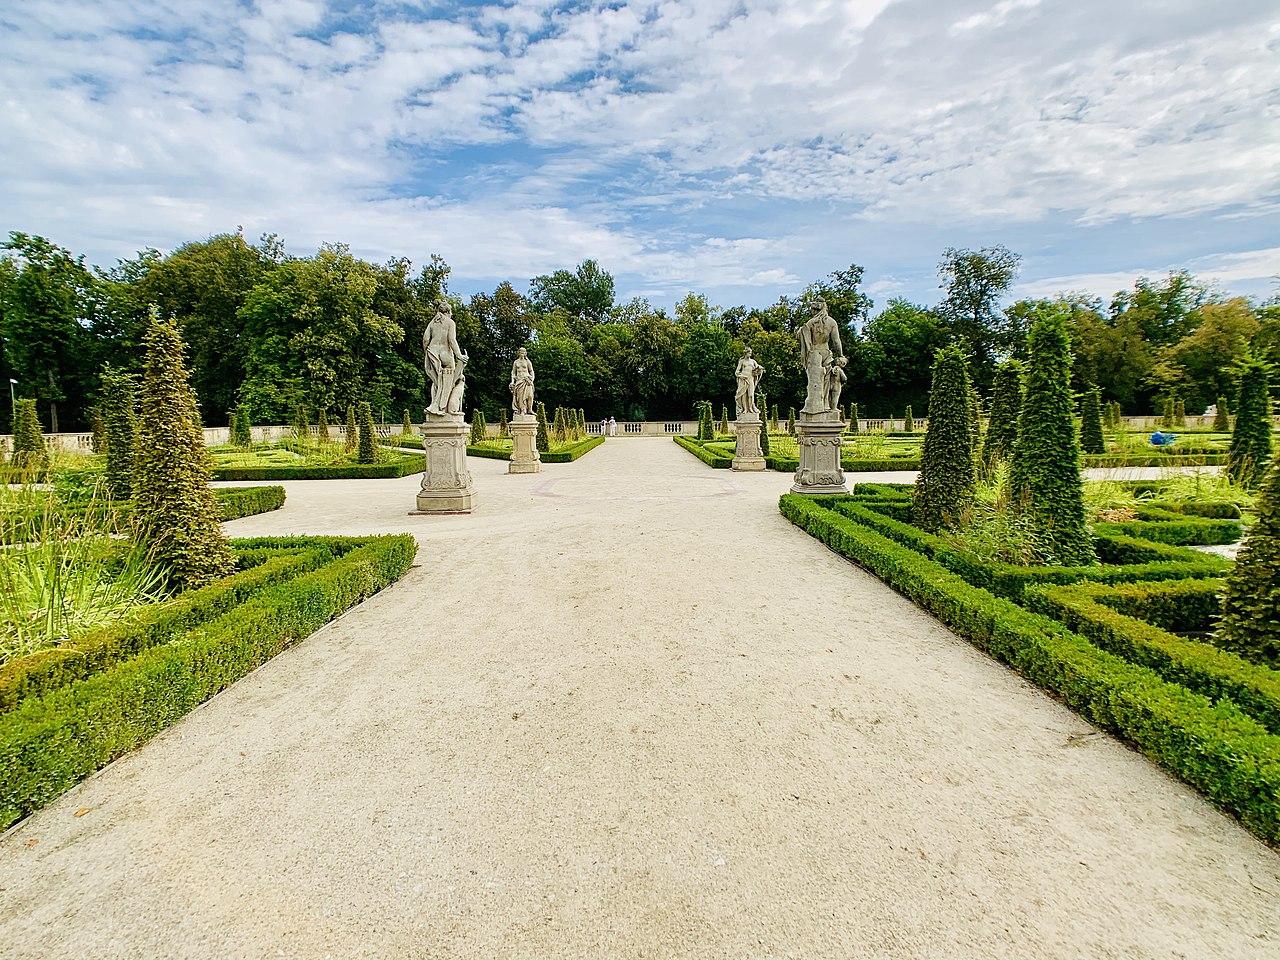 Garden sculptures of the Wilanów Palace, Poland 01.jpg